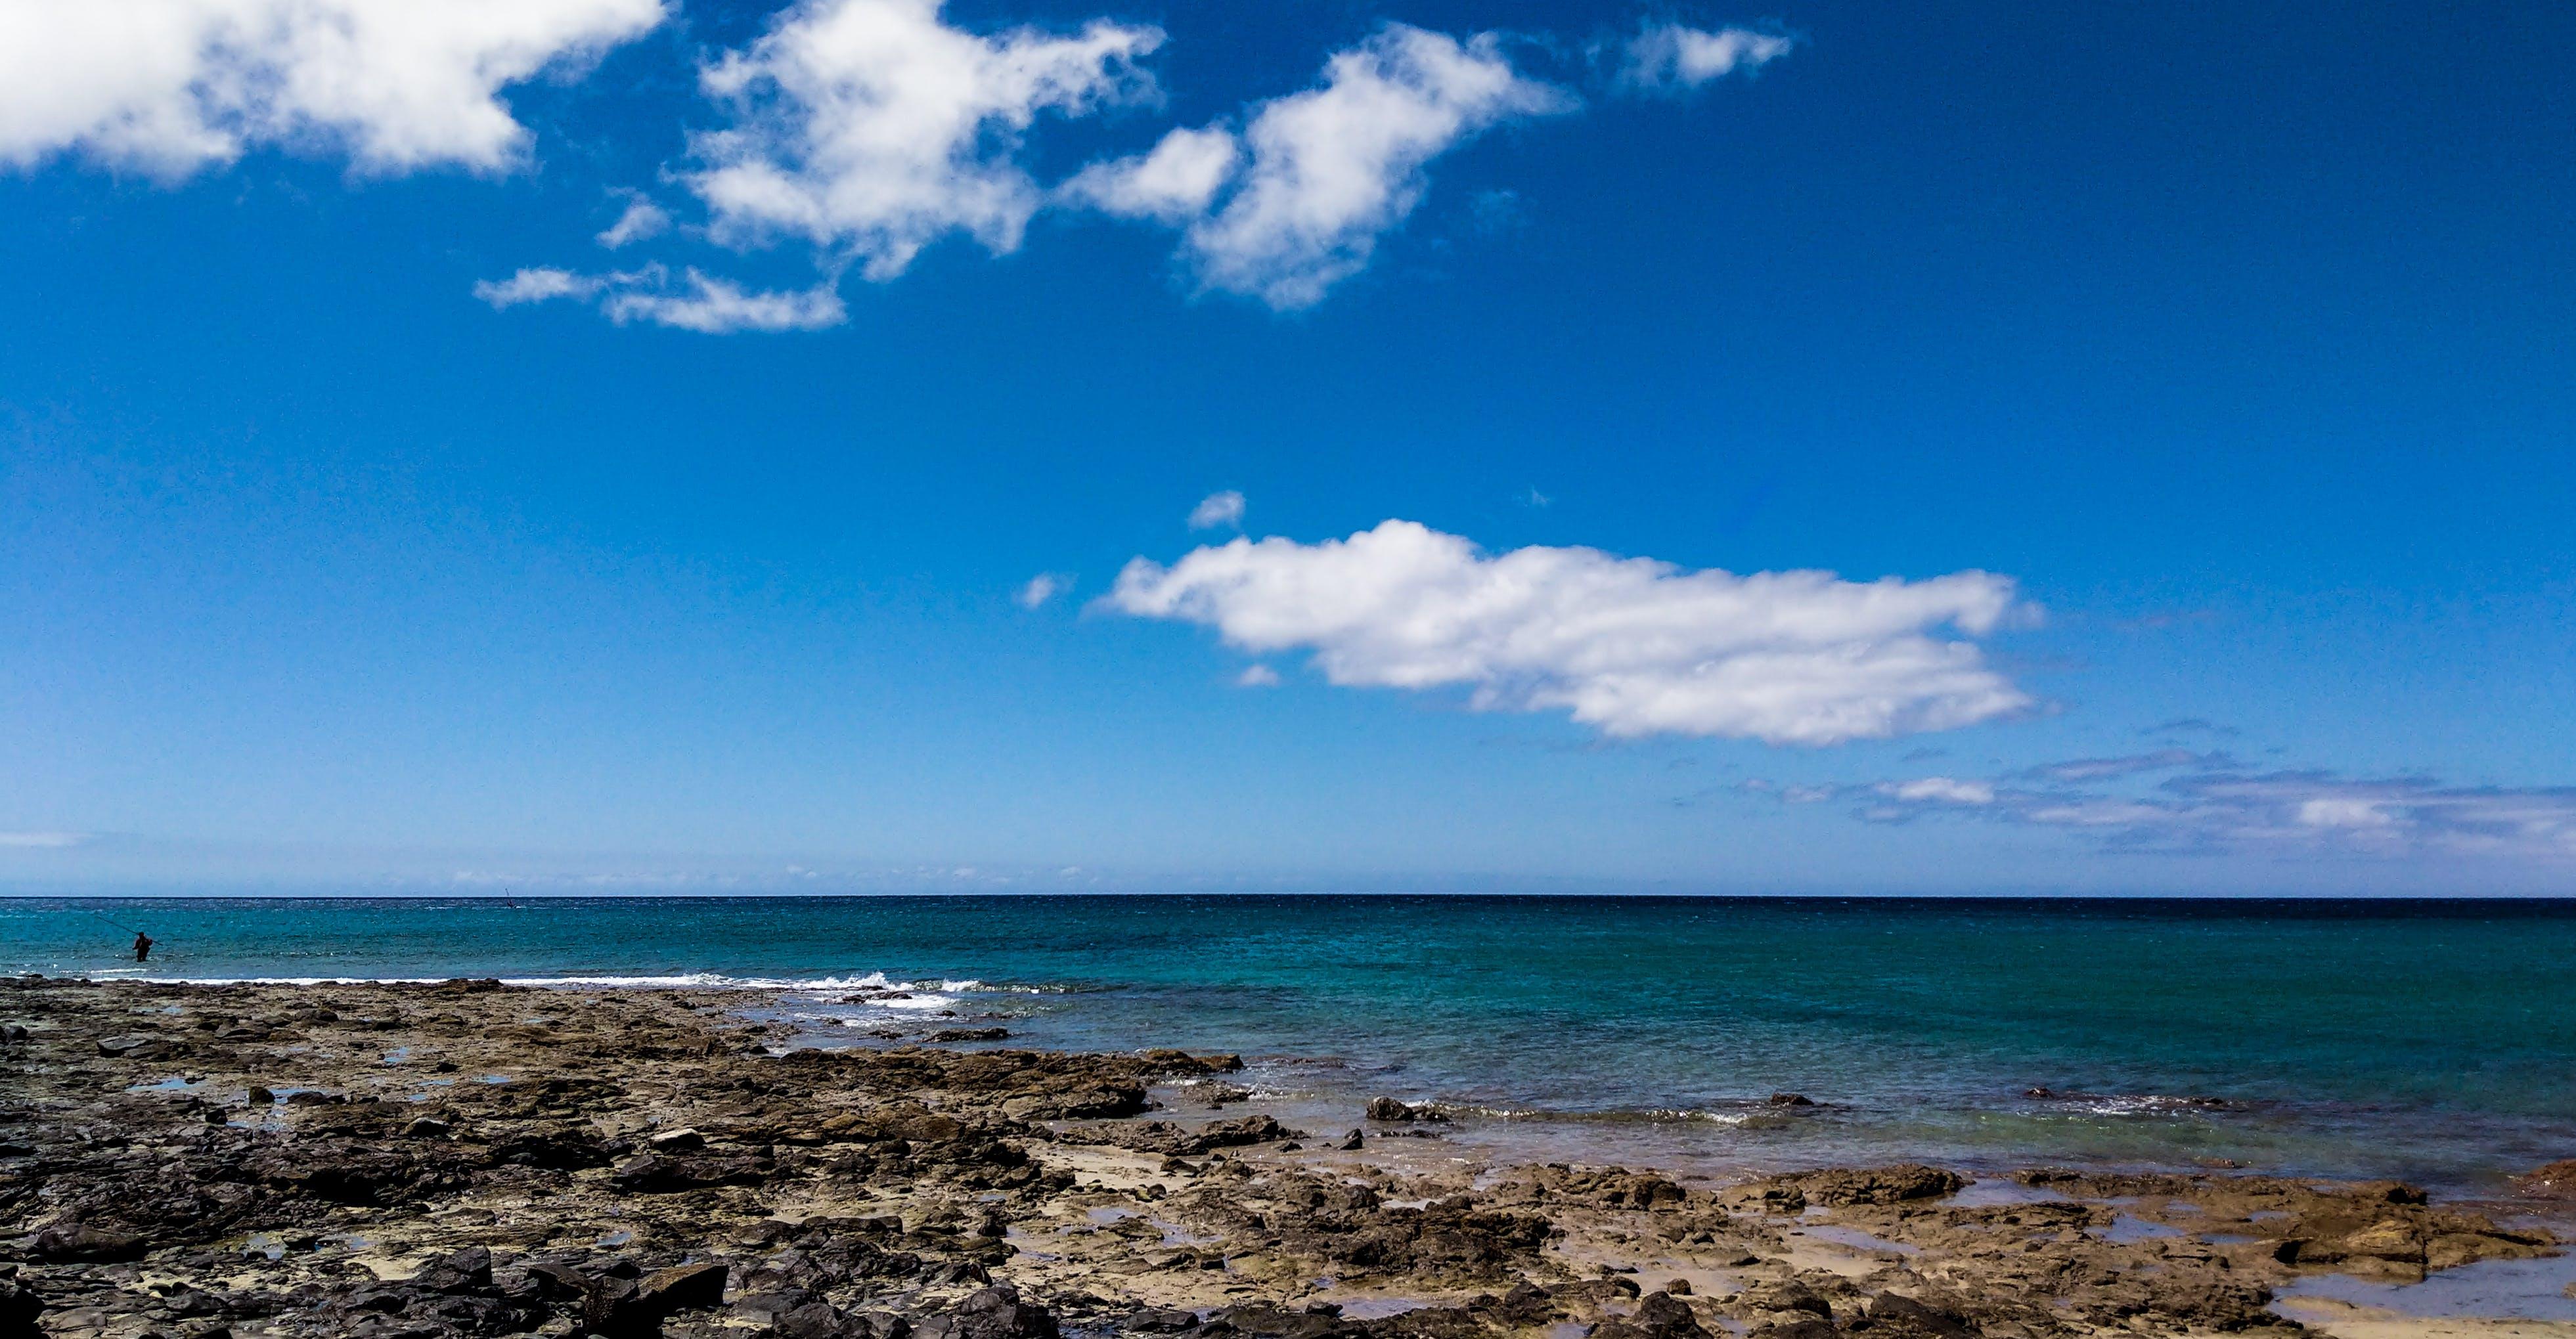 Free stock photo of beach, ocean, water